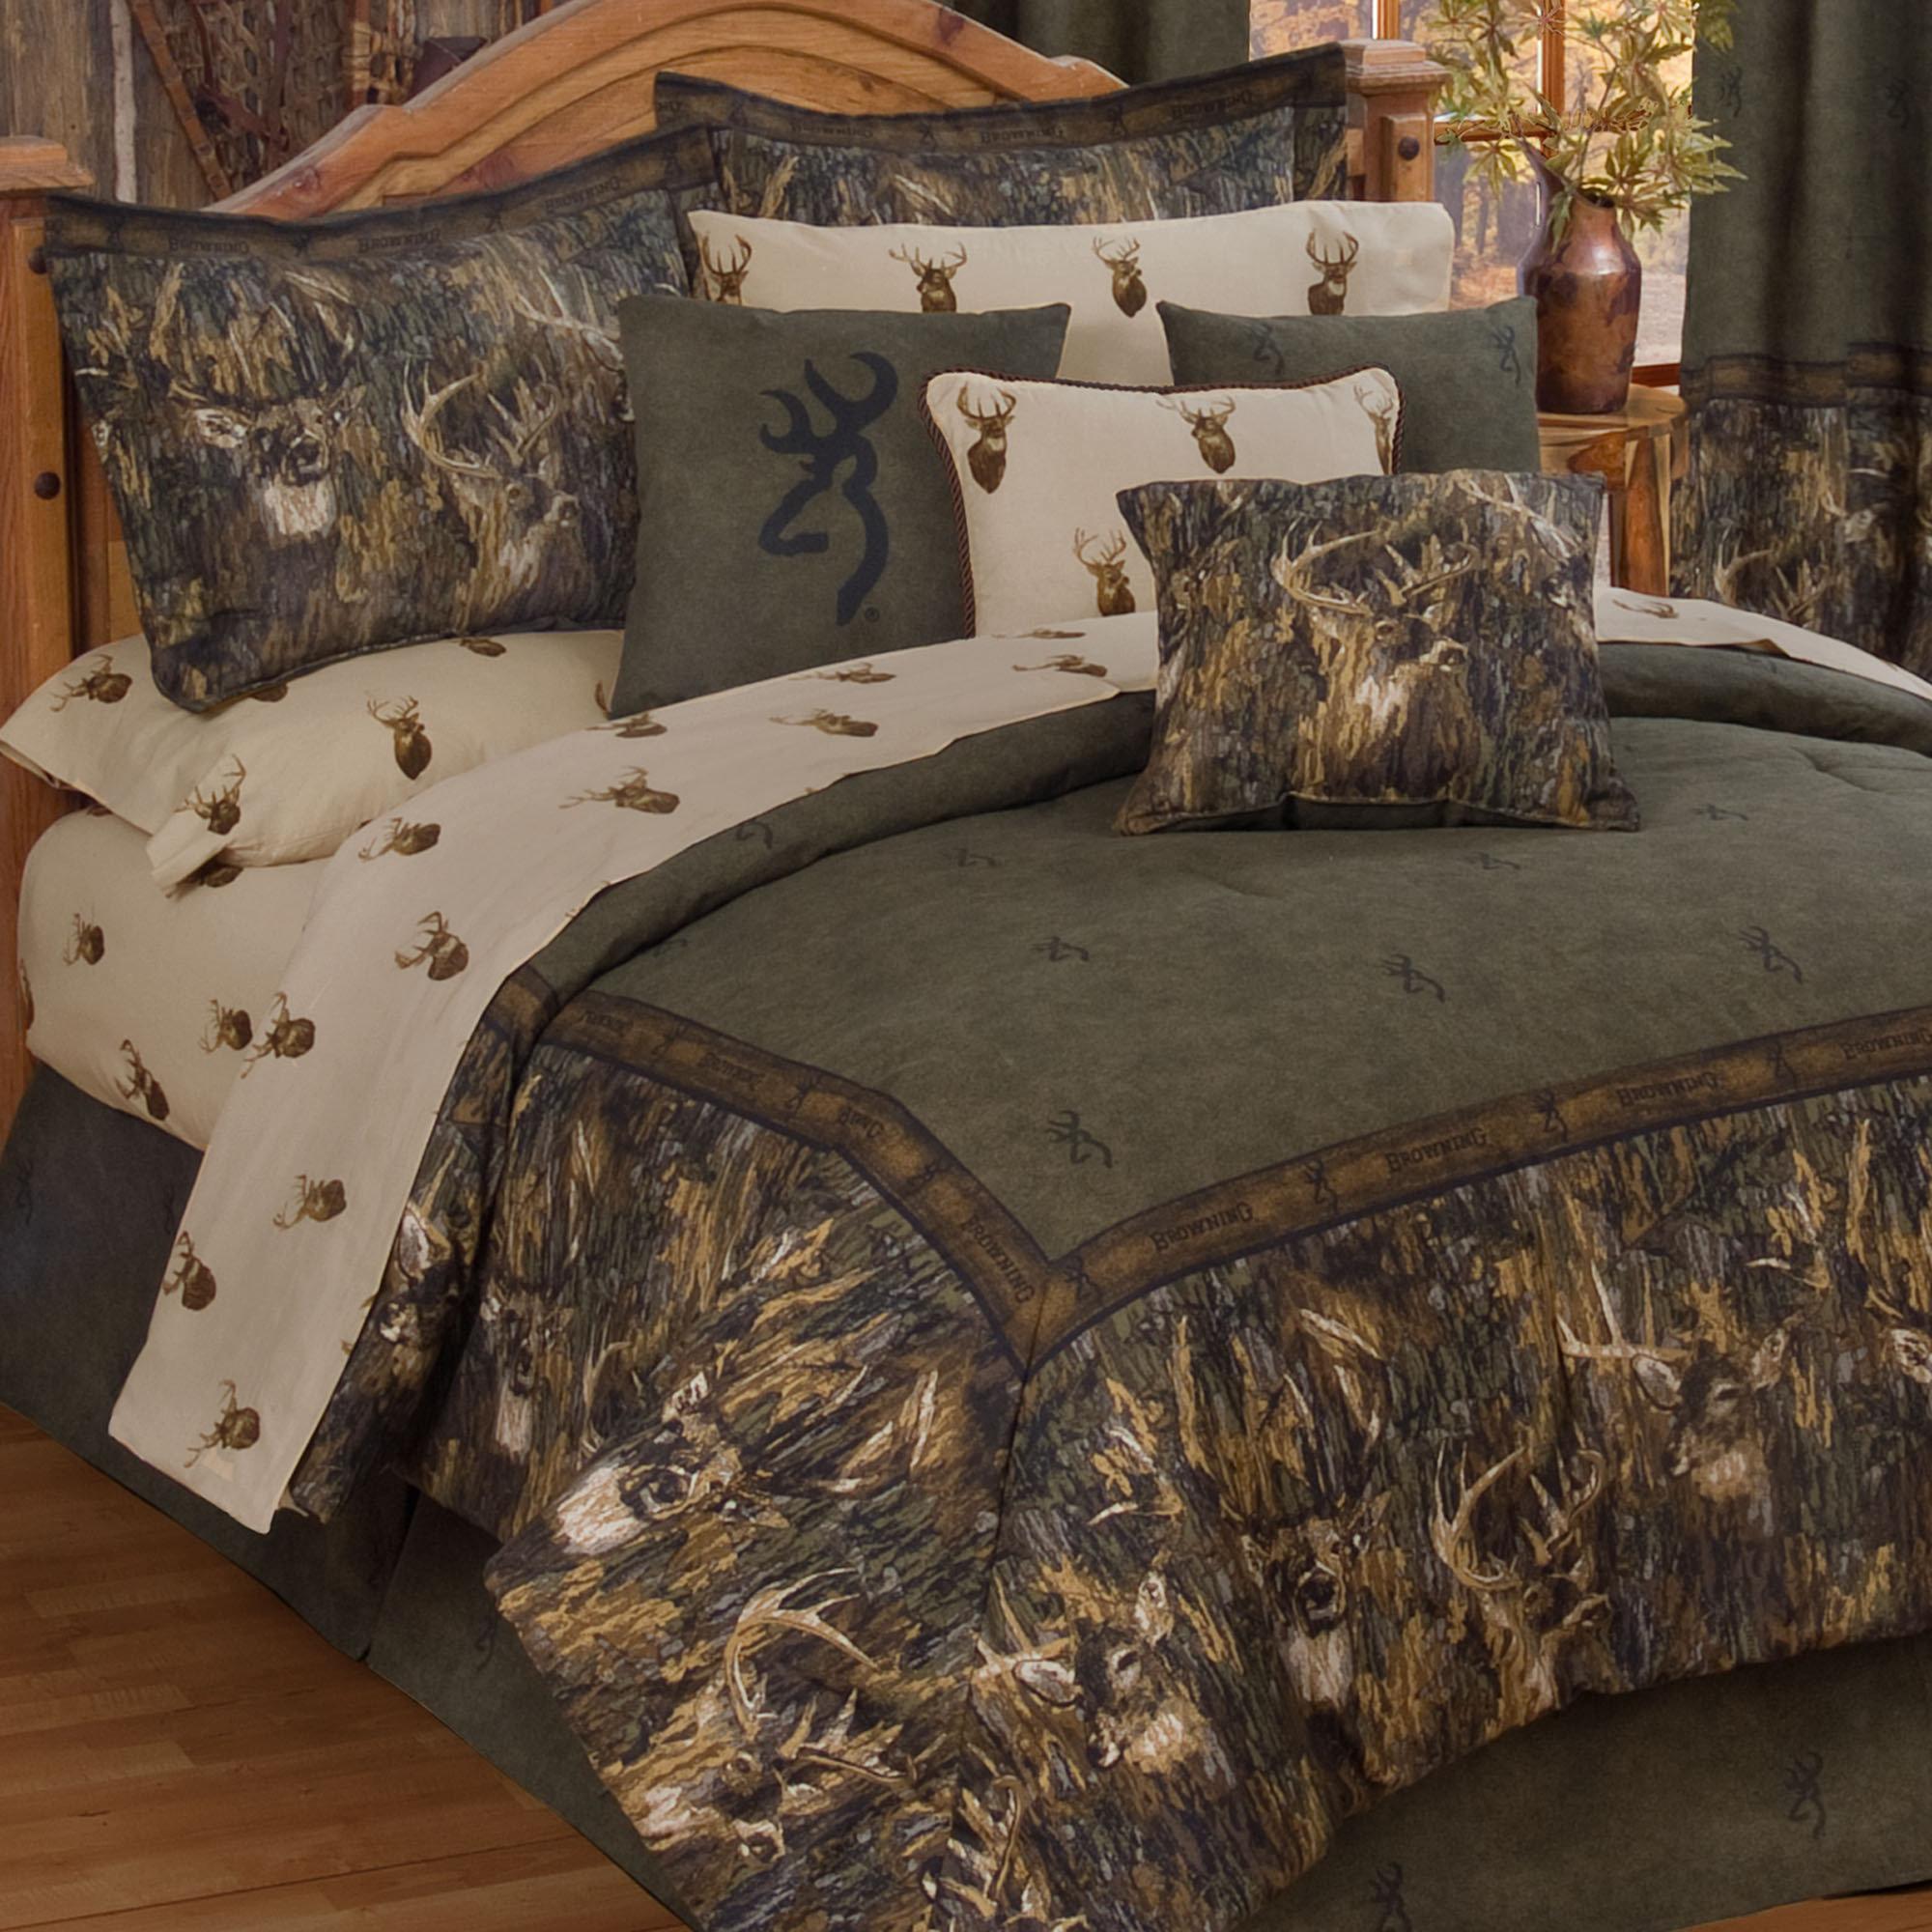 BrowningR Whitetails Deer Camo Comforter Bedding 2000x2000